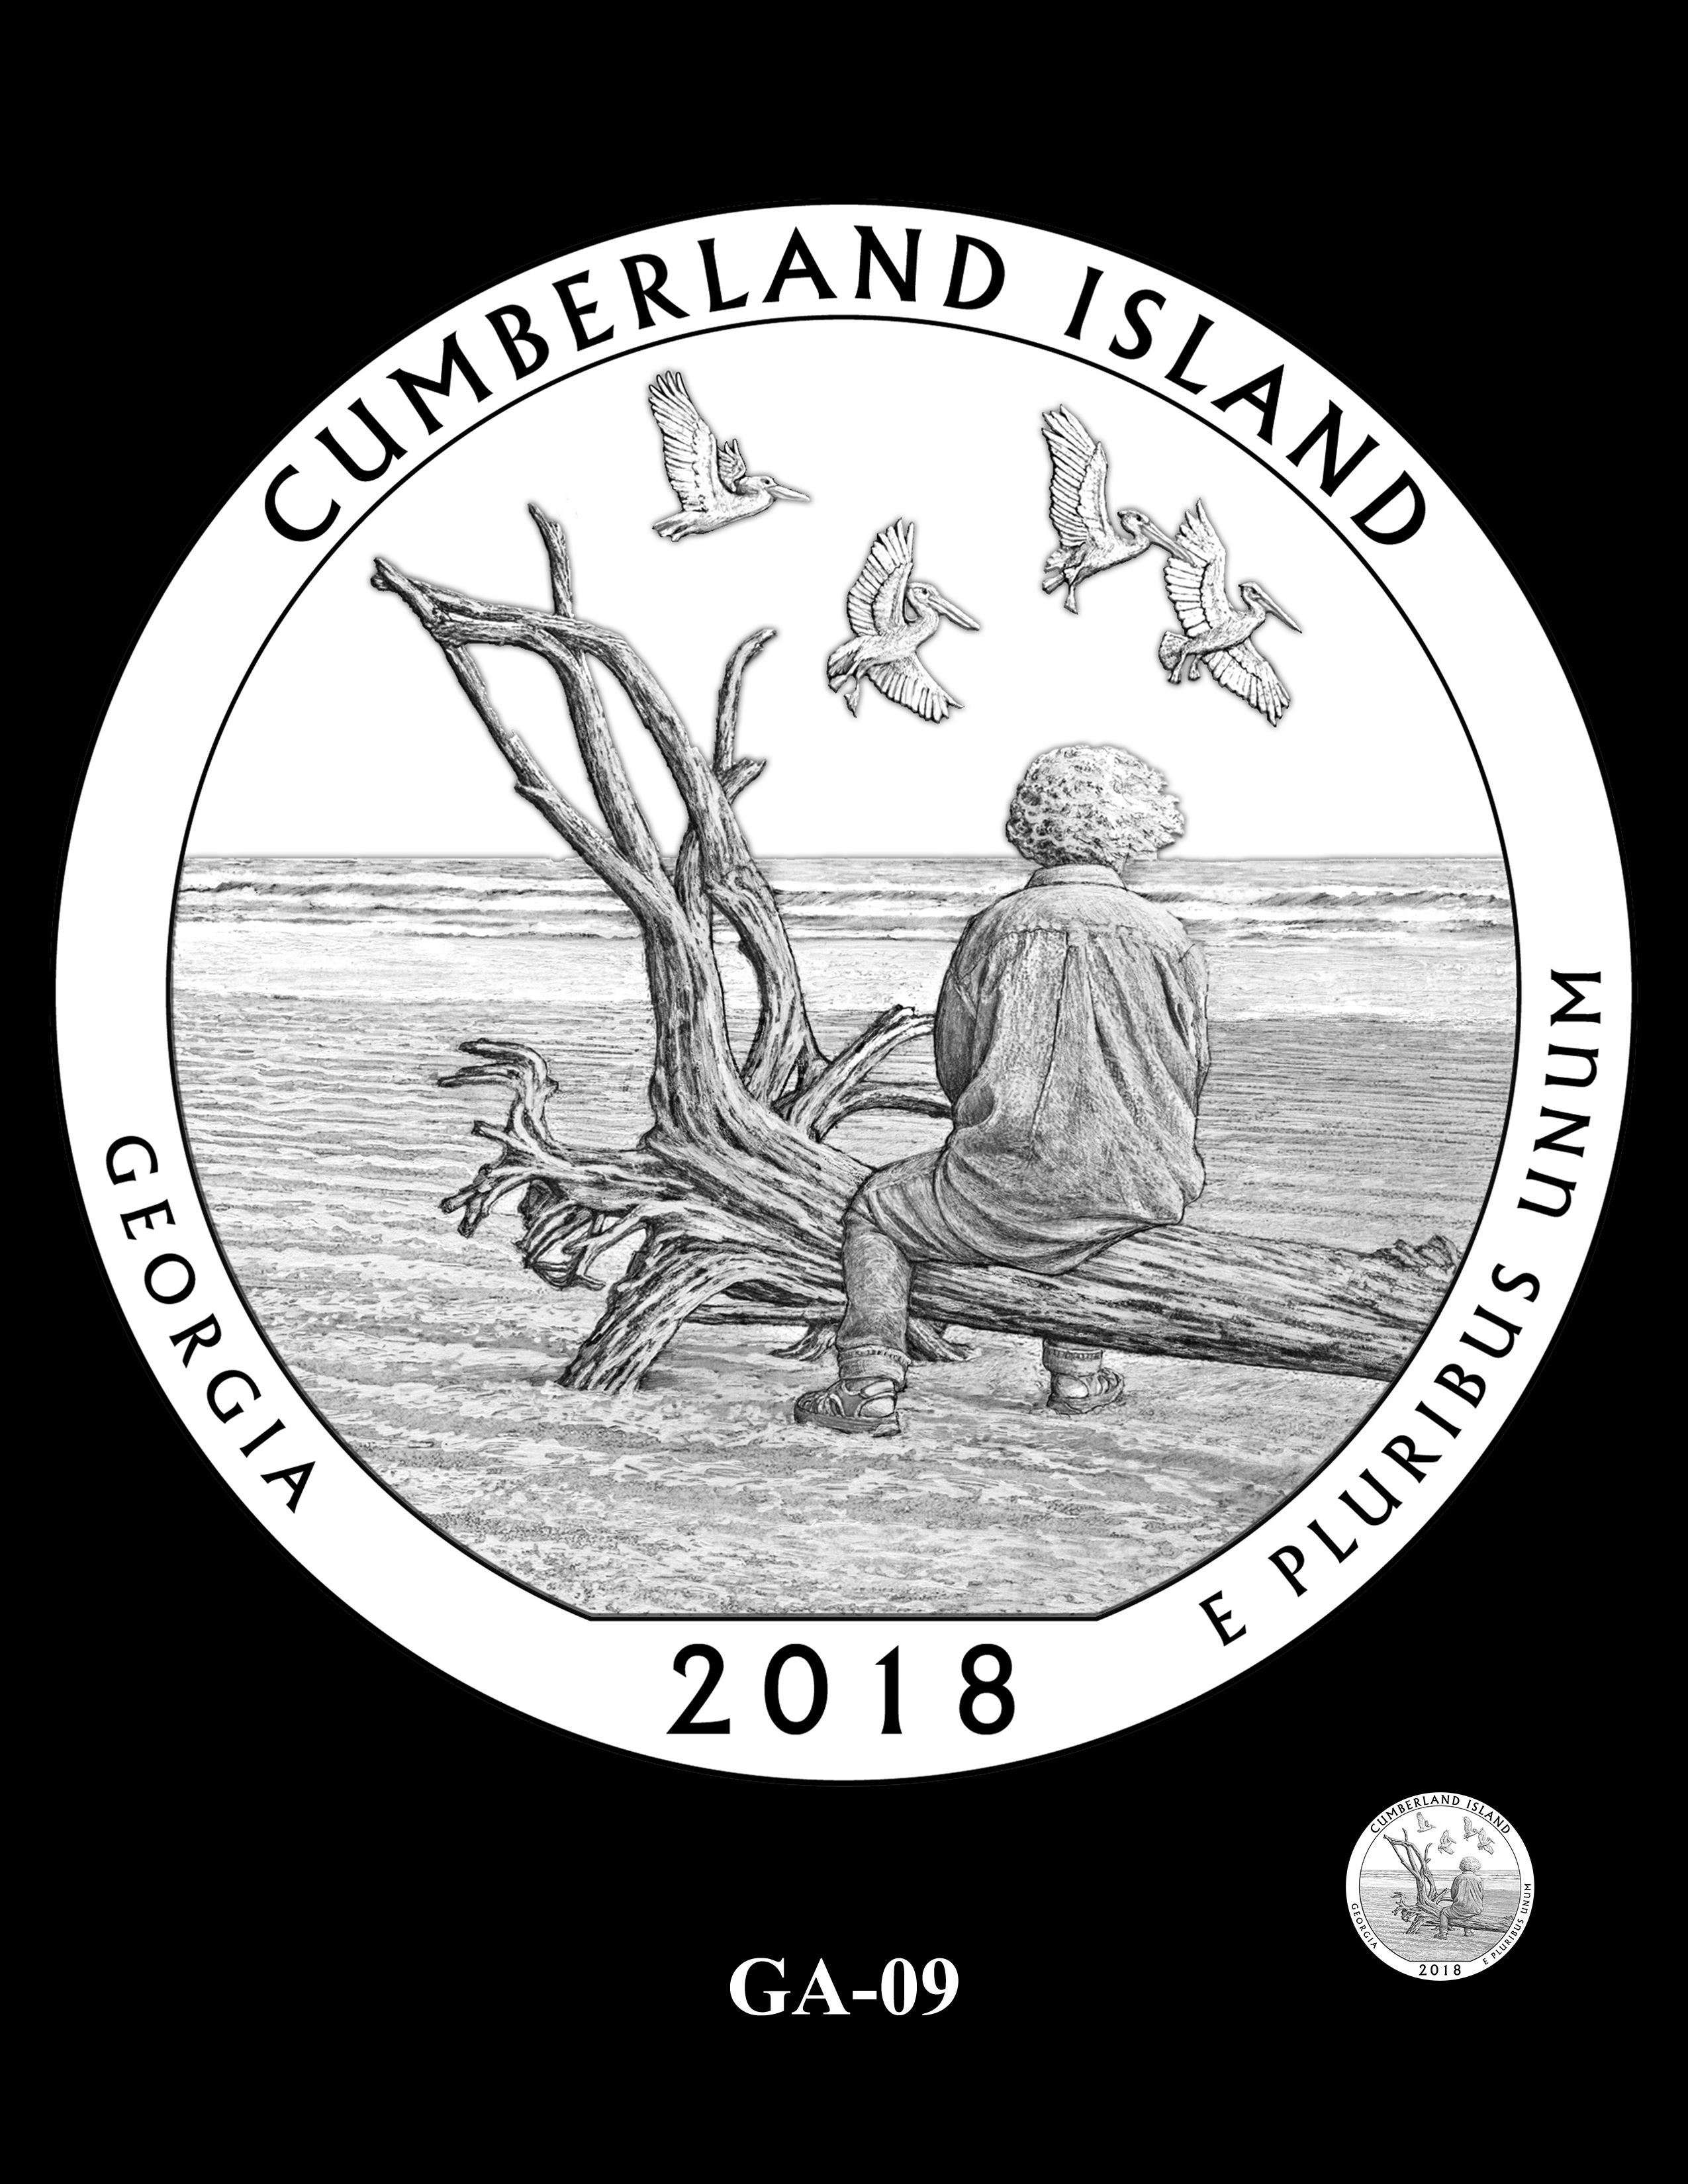 GA-09 -- 2018 America the Beautiful® Quarters Program